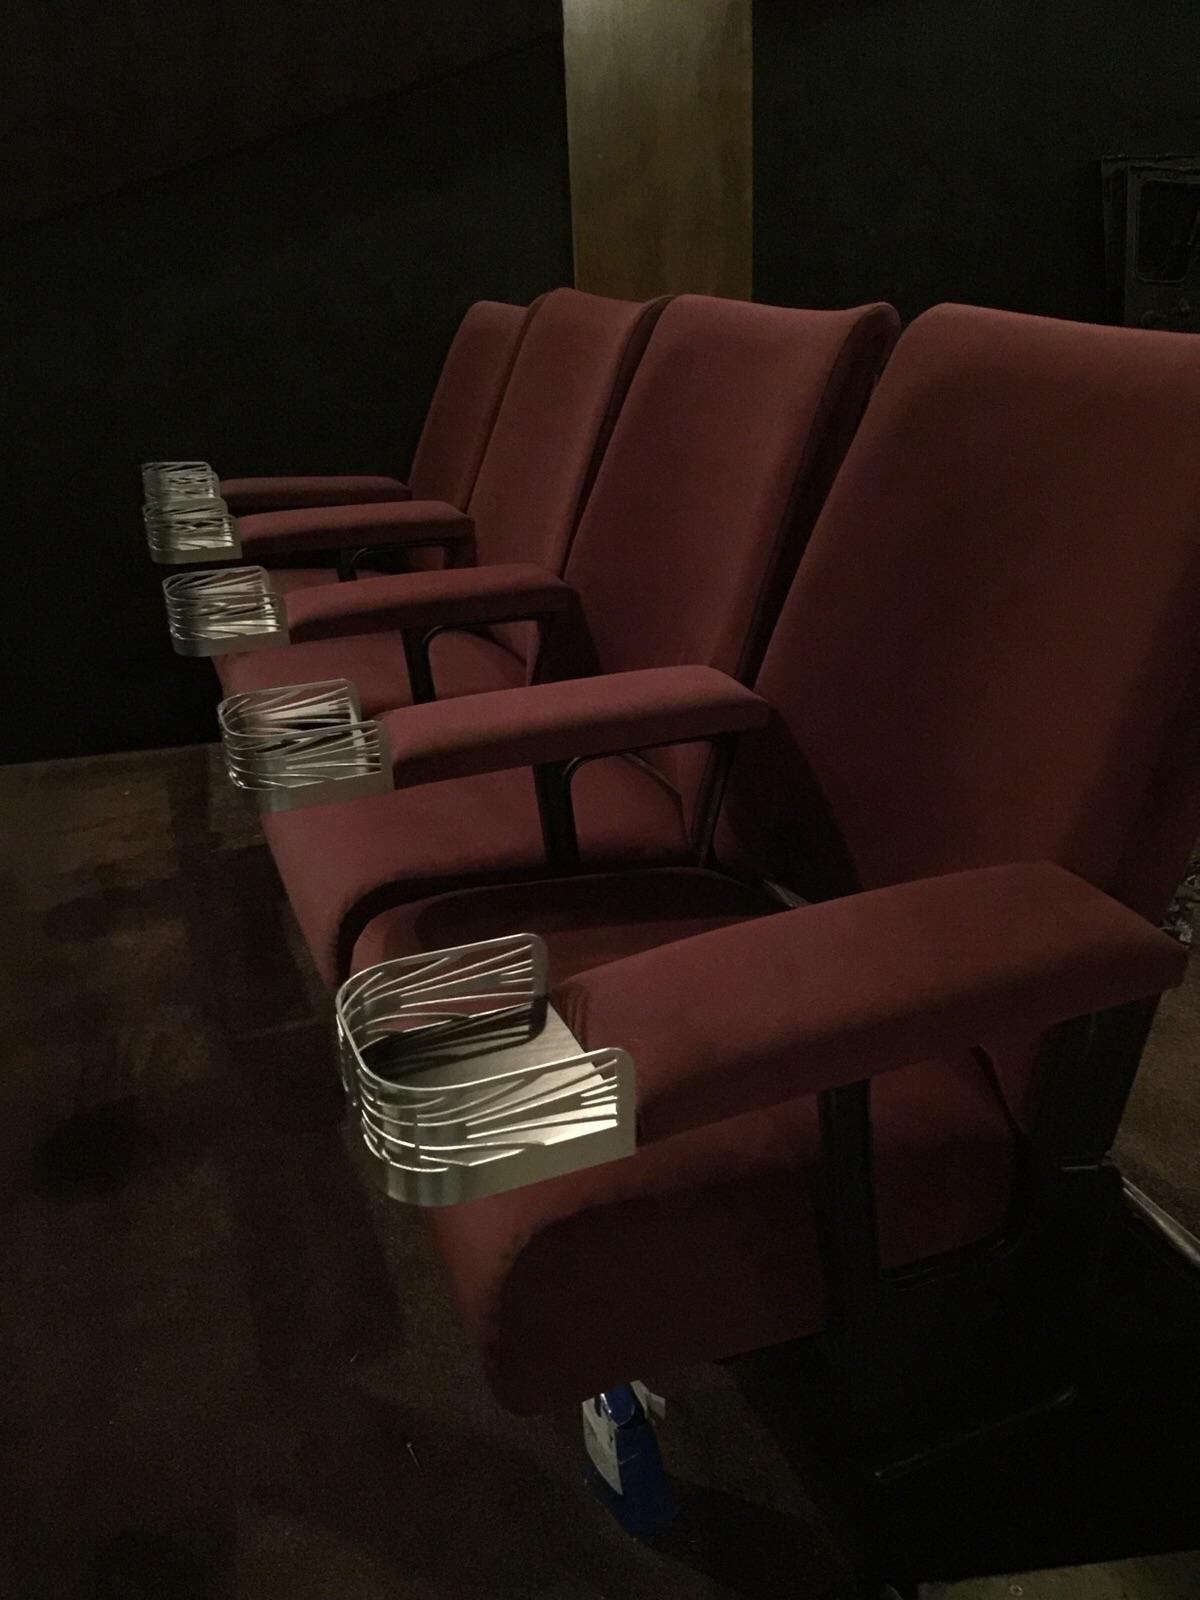 Photo 15 10 2015 12 33 15 custom theatre seating